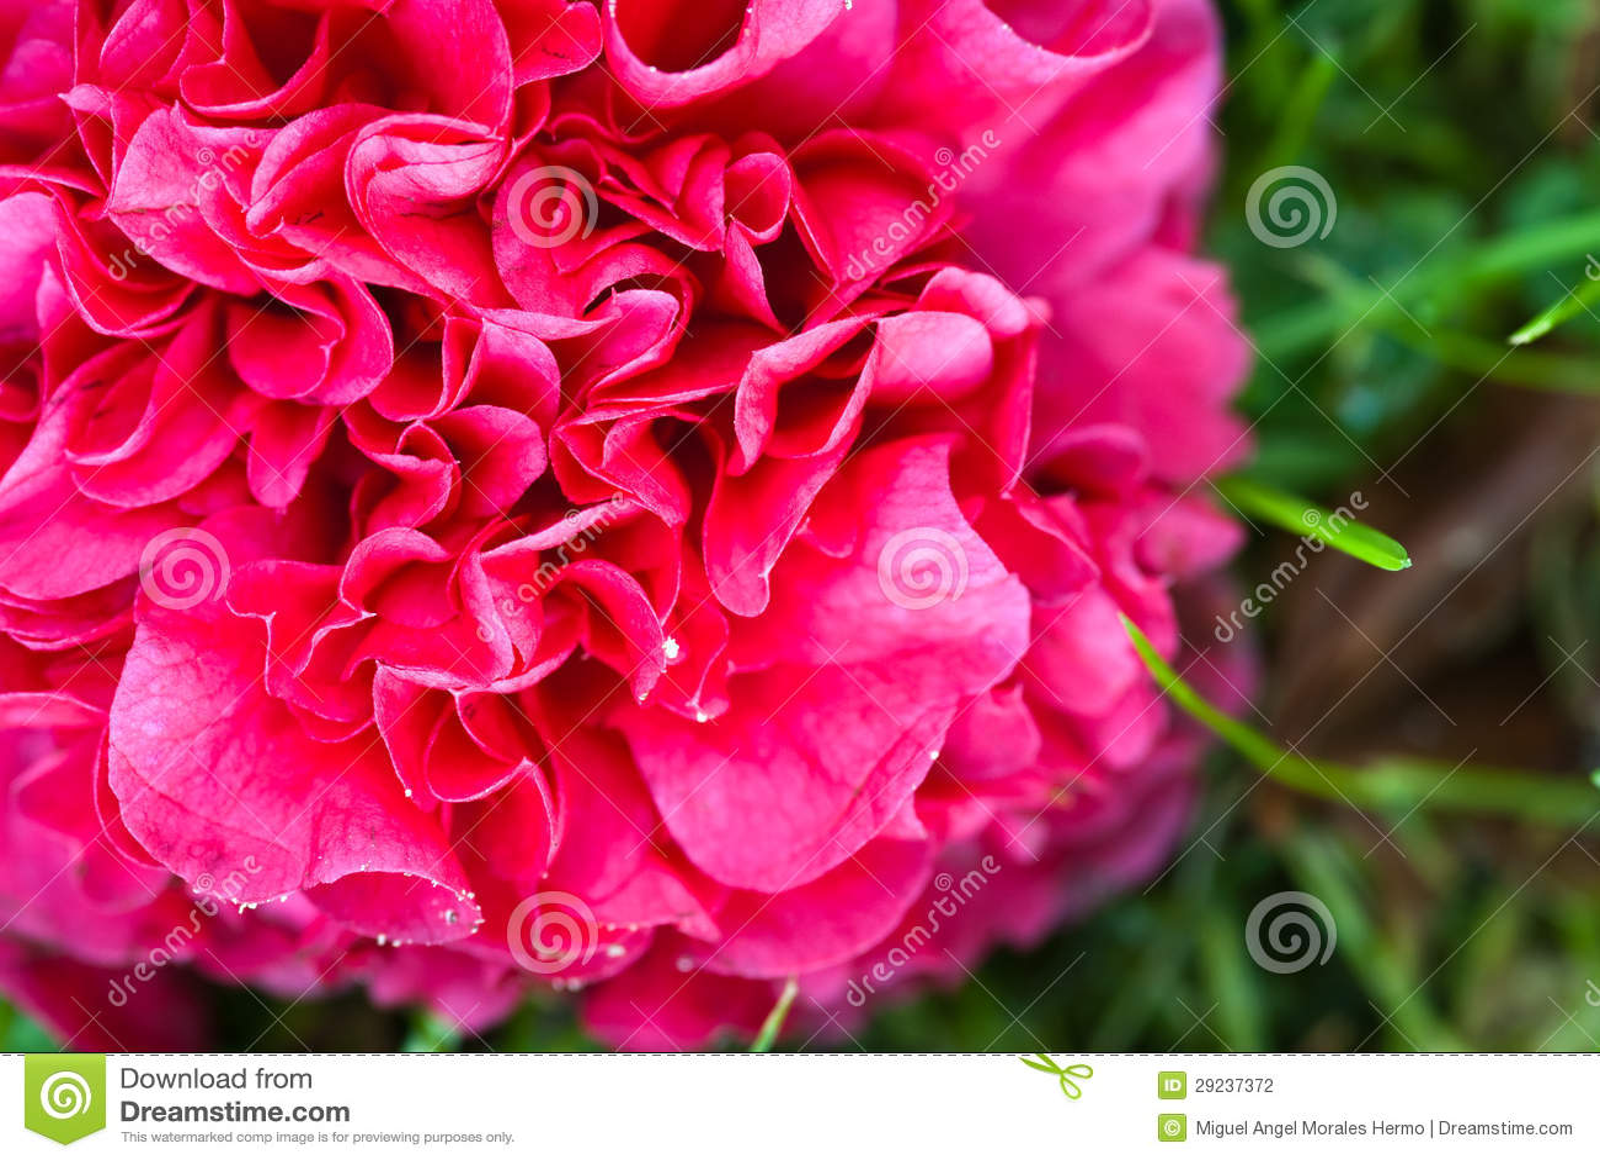 Download Camélia foto de stock. Imagem de jardinar, macro, nave - 29237372